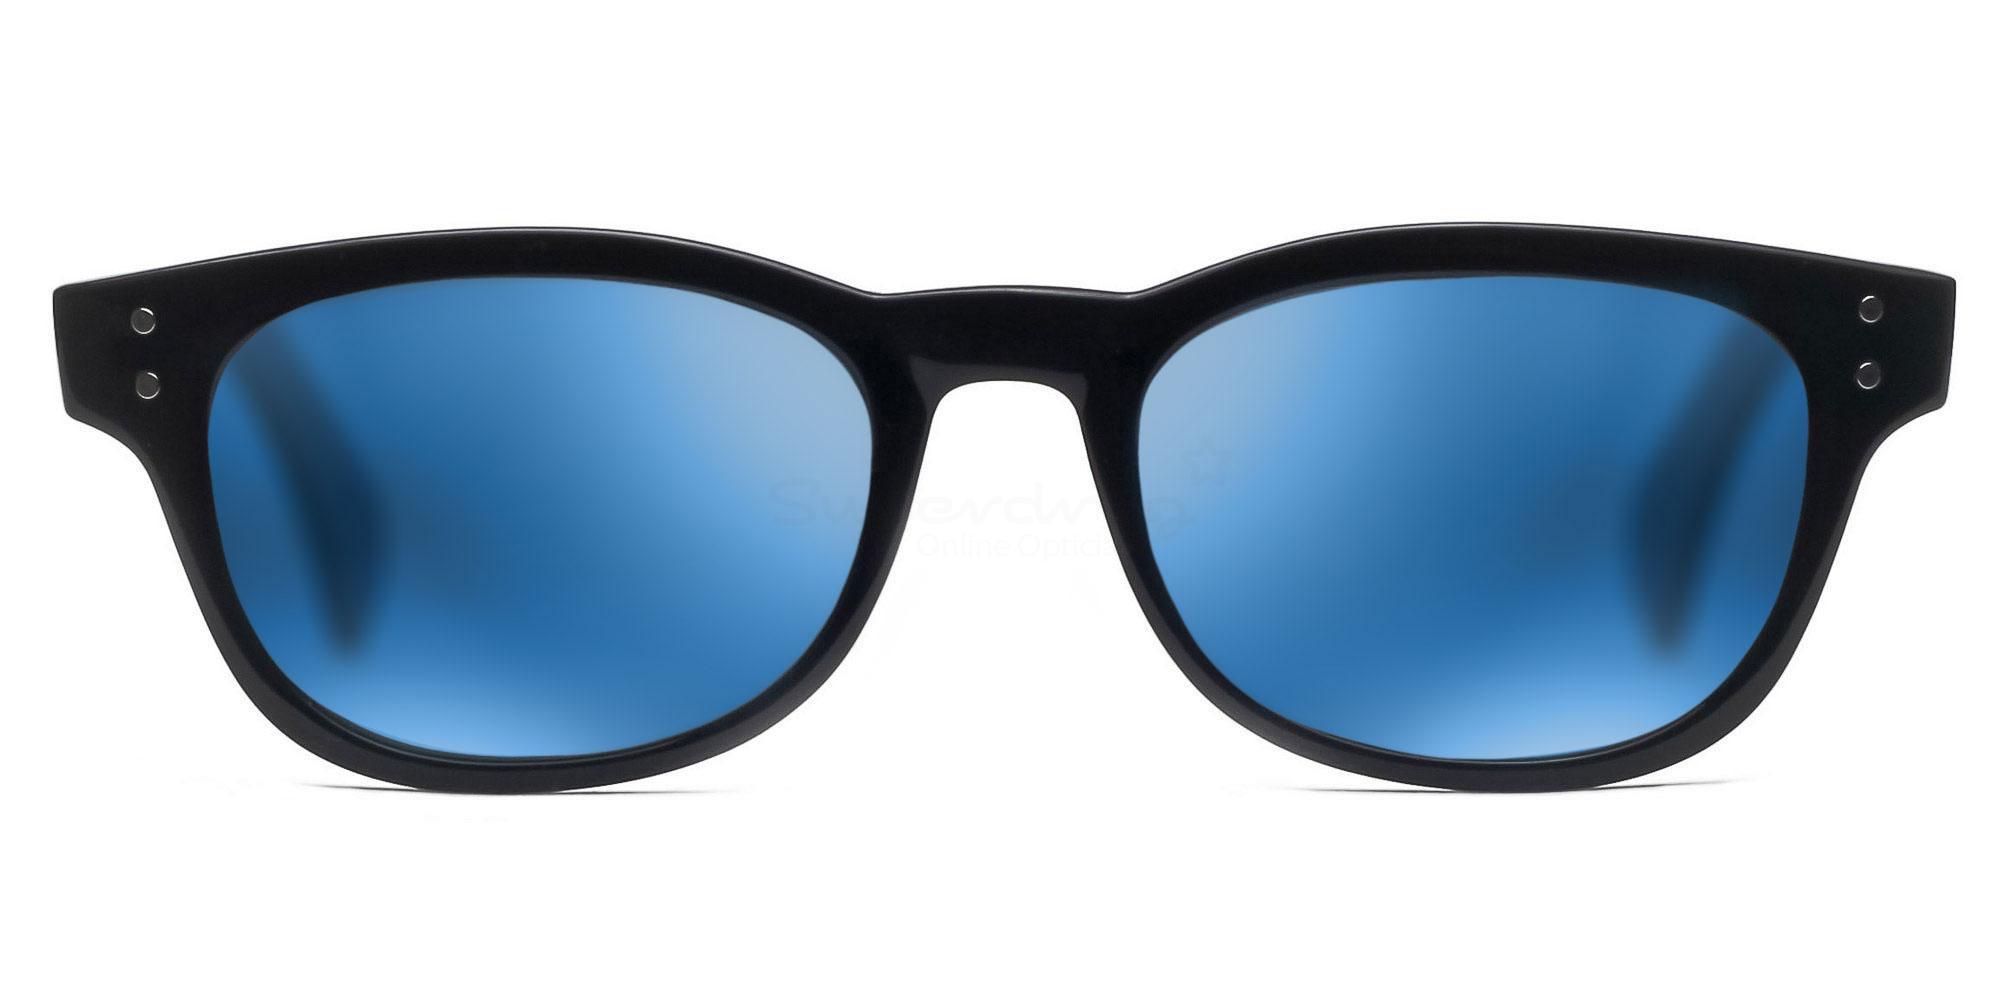 C01 Polarized Grey with Blue Mirror P2249 Shiny Black (Mirrored Polarized) Sunglasses, Neon